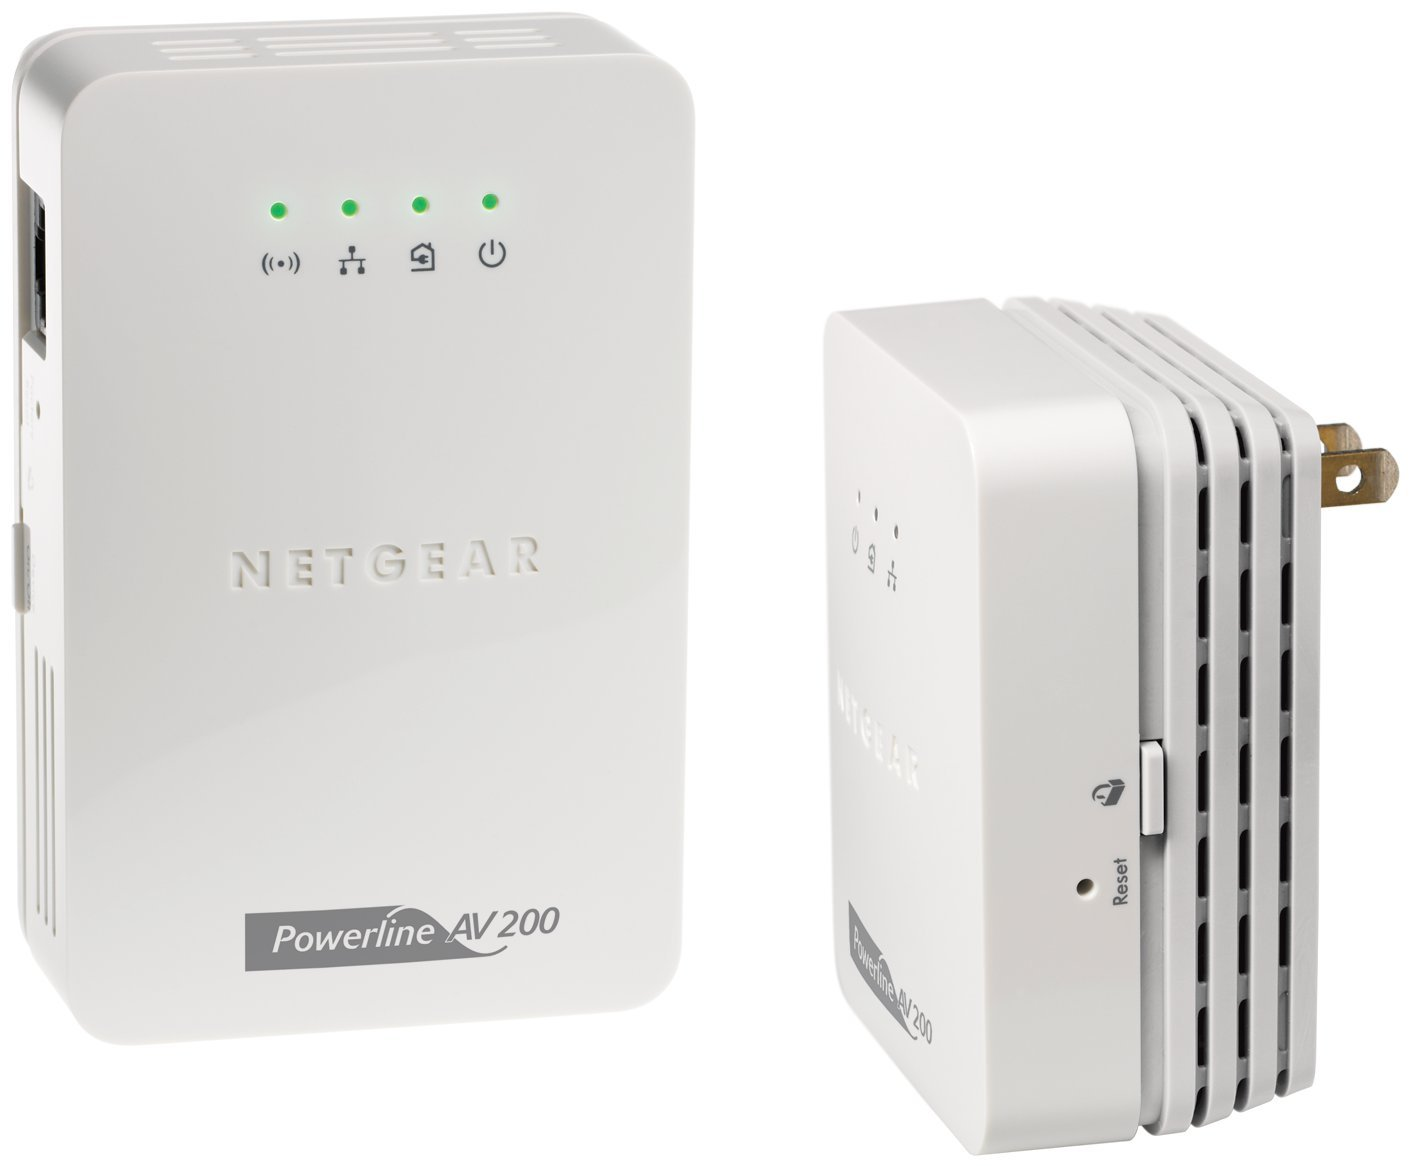 NETGEAR Powerline 200Mbps to N300 Wi-Fi Access Point (XAVNB2001) by NETGEAR